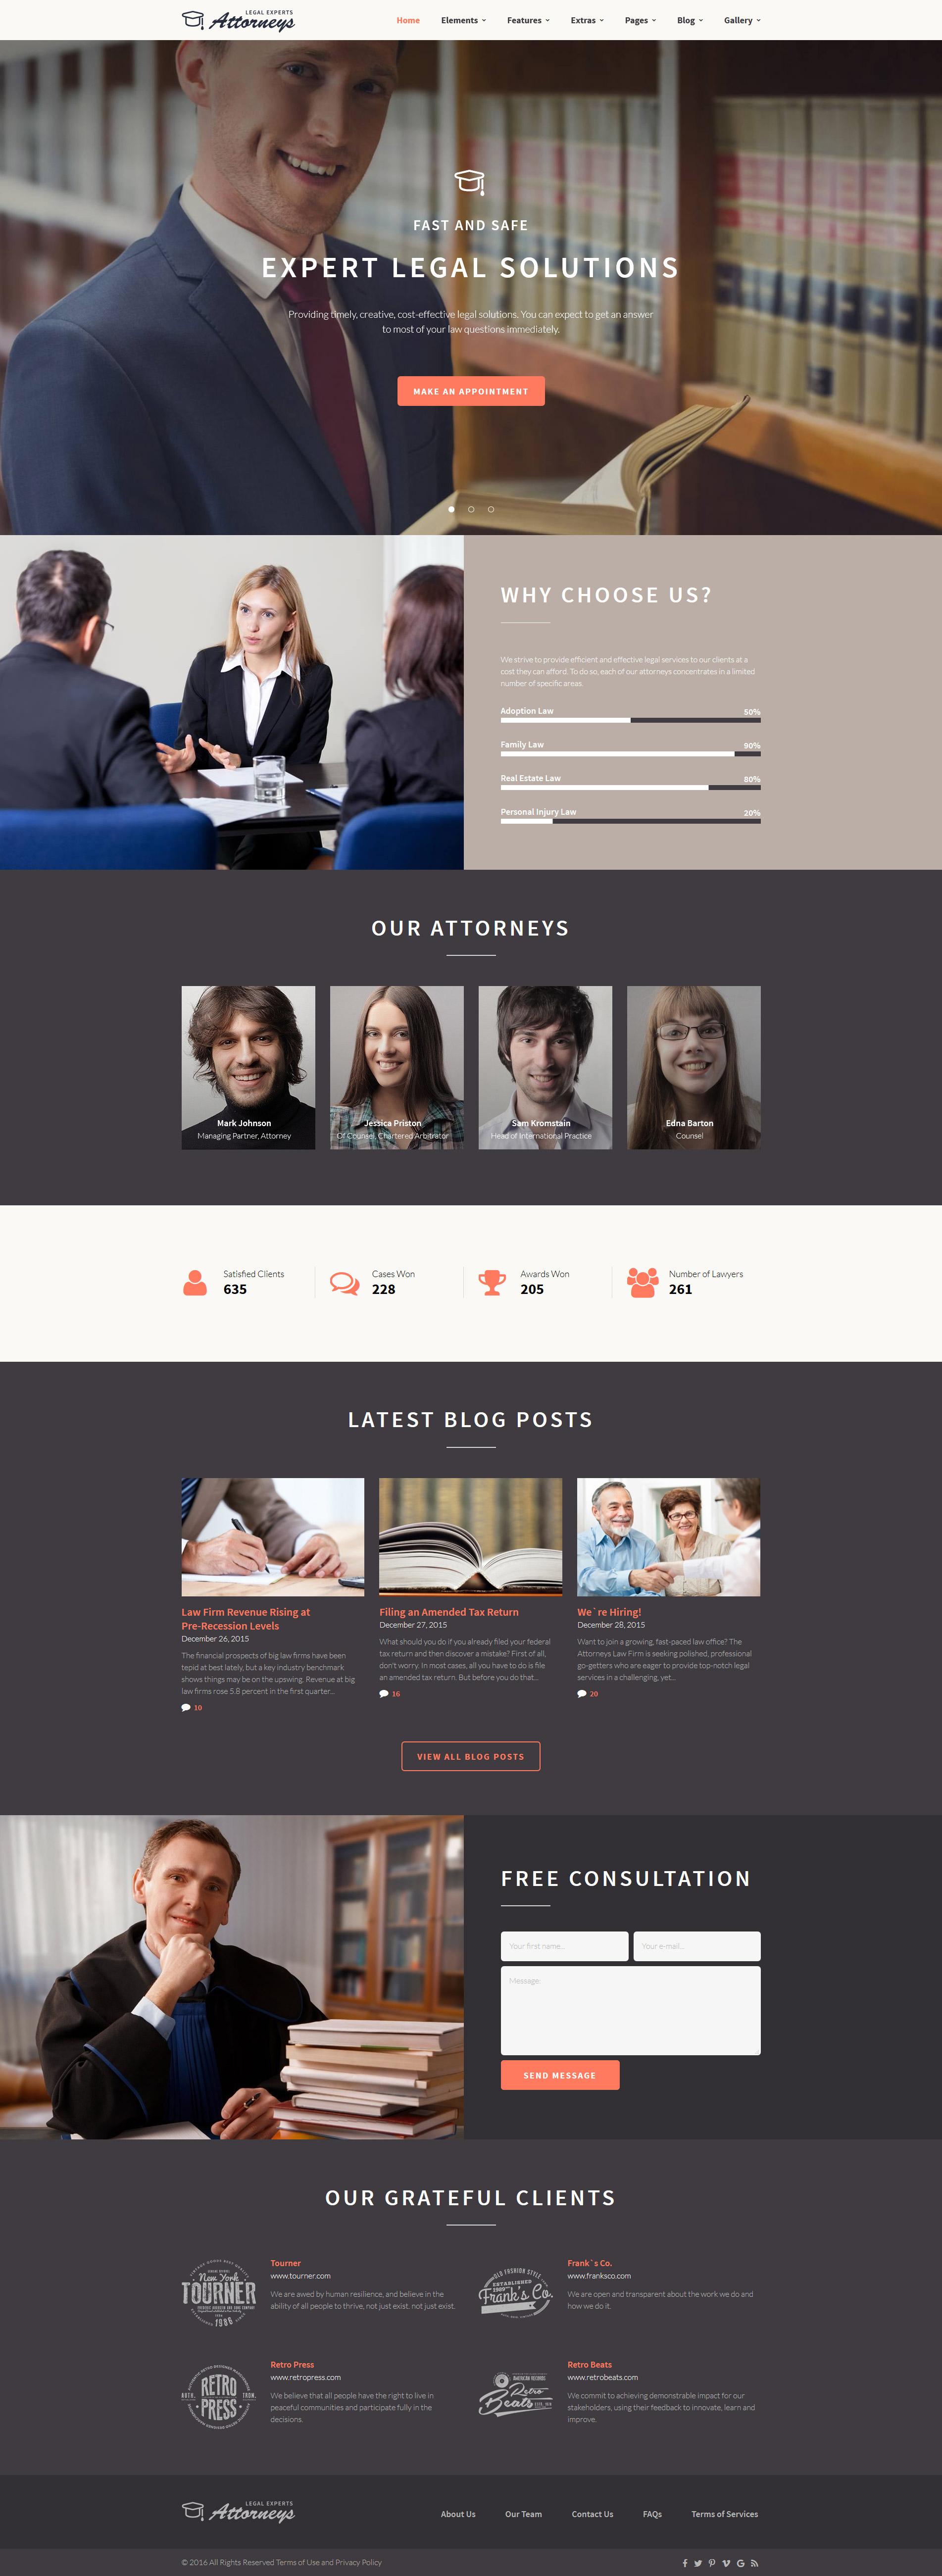 law firm responsive website template 58966. Black Bedroom Furniture Sets. Home Design Ideas